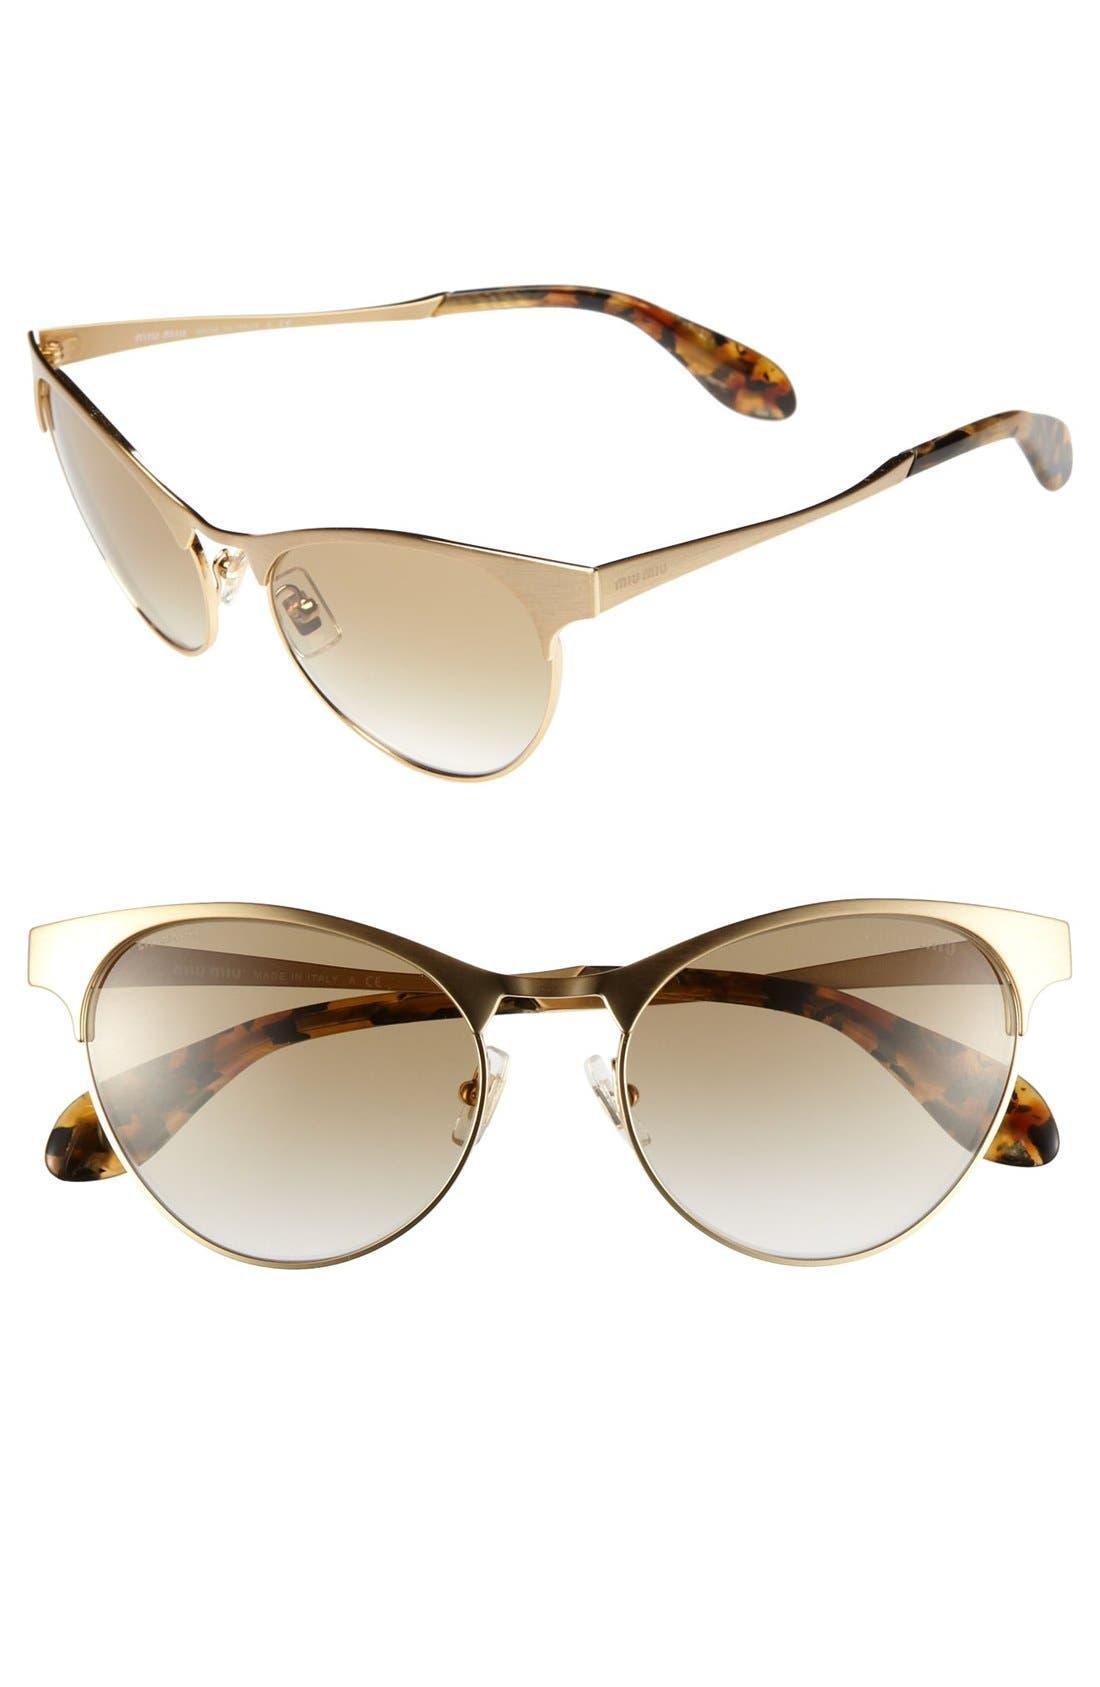 Alternate Image 1 Selected - Miu Miu Cat's Eye Sunglasses